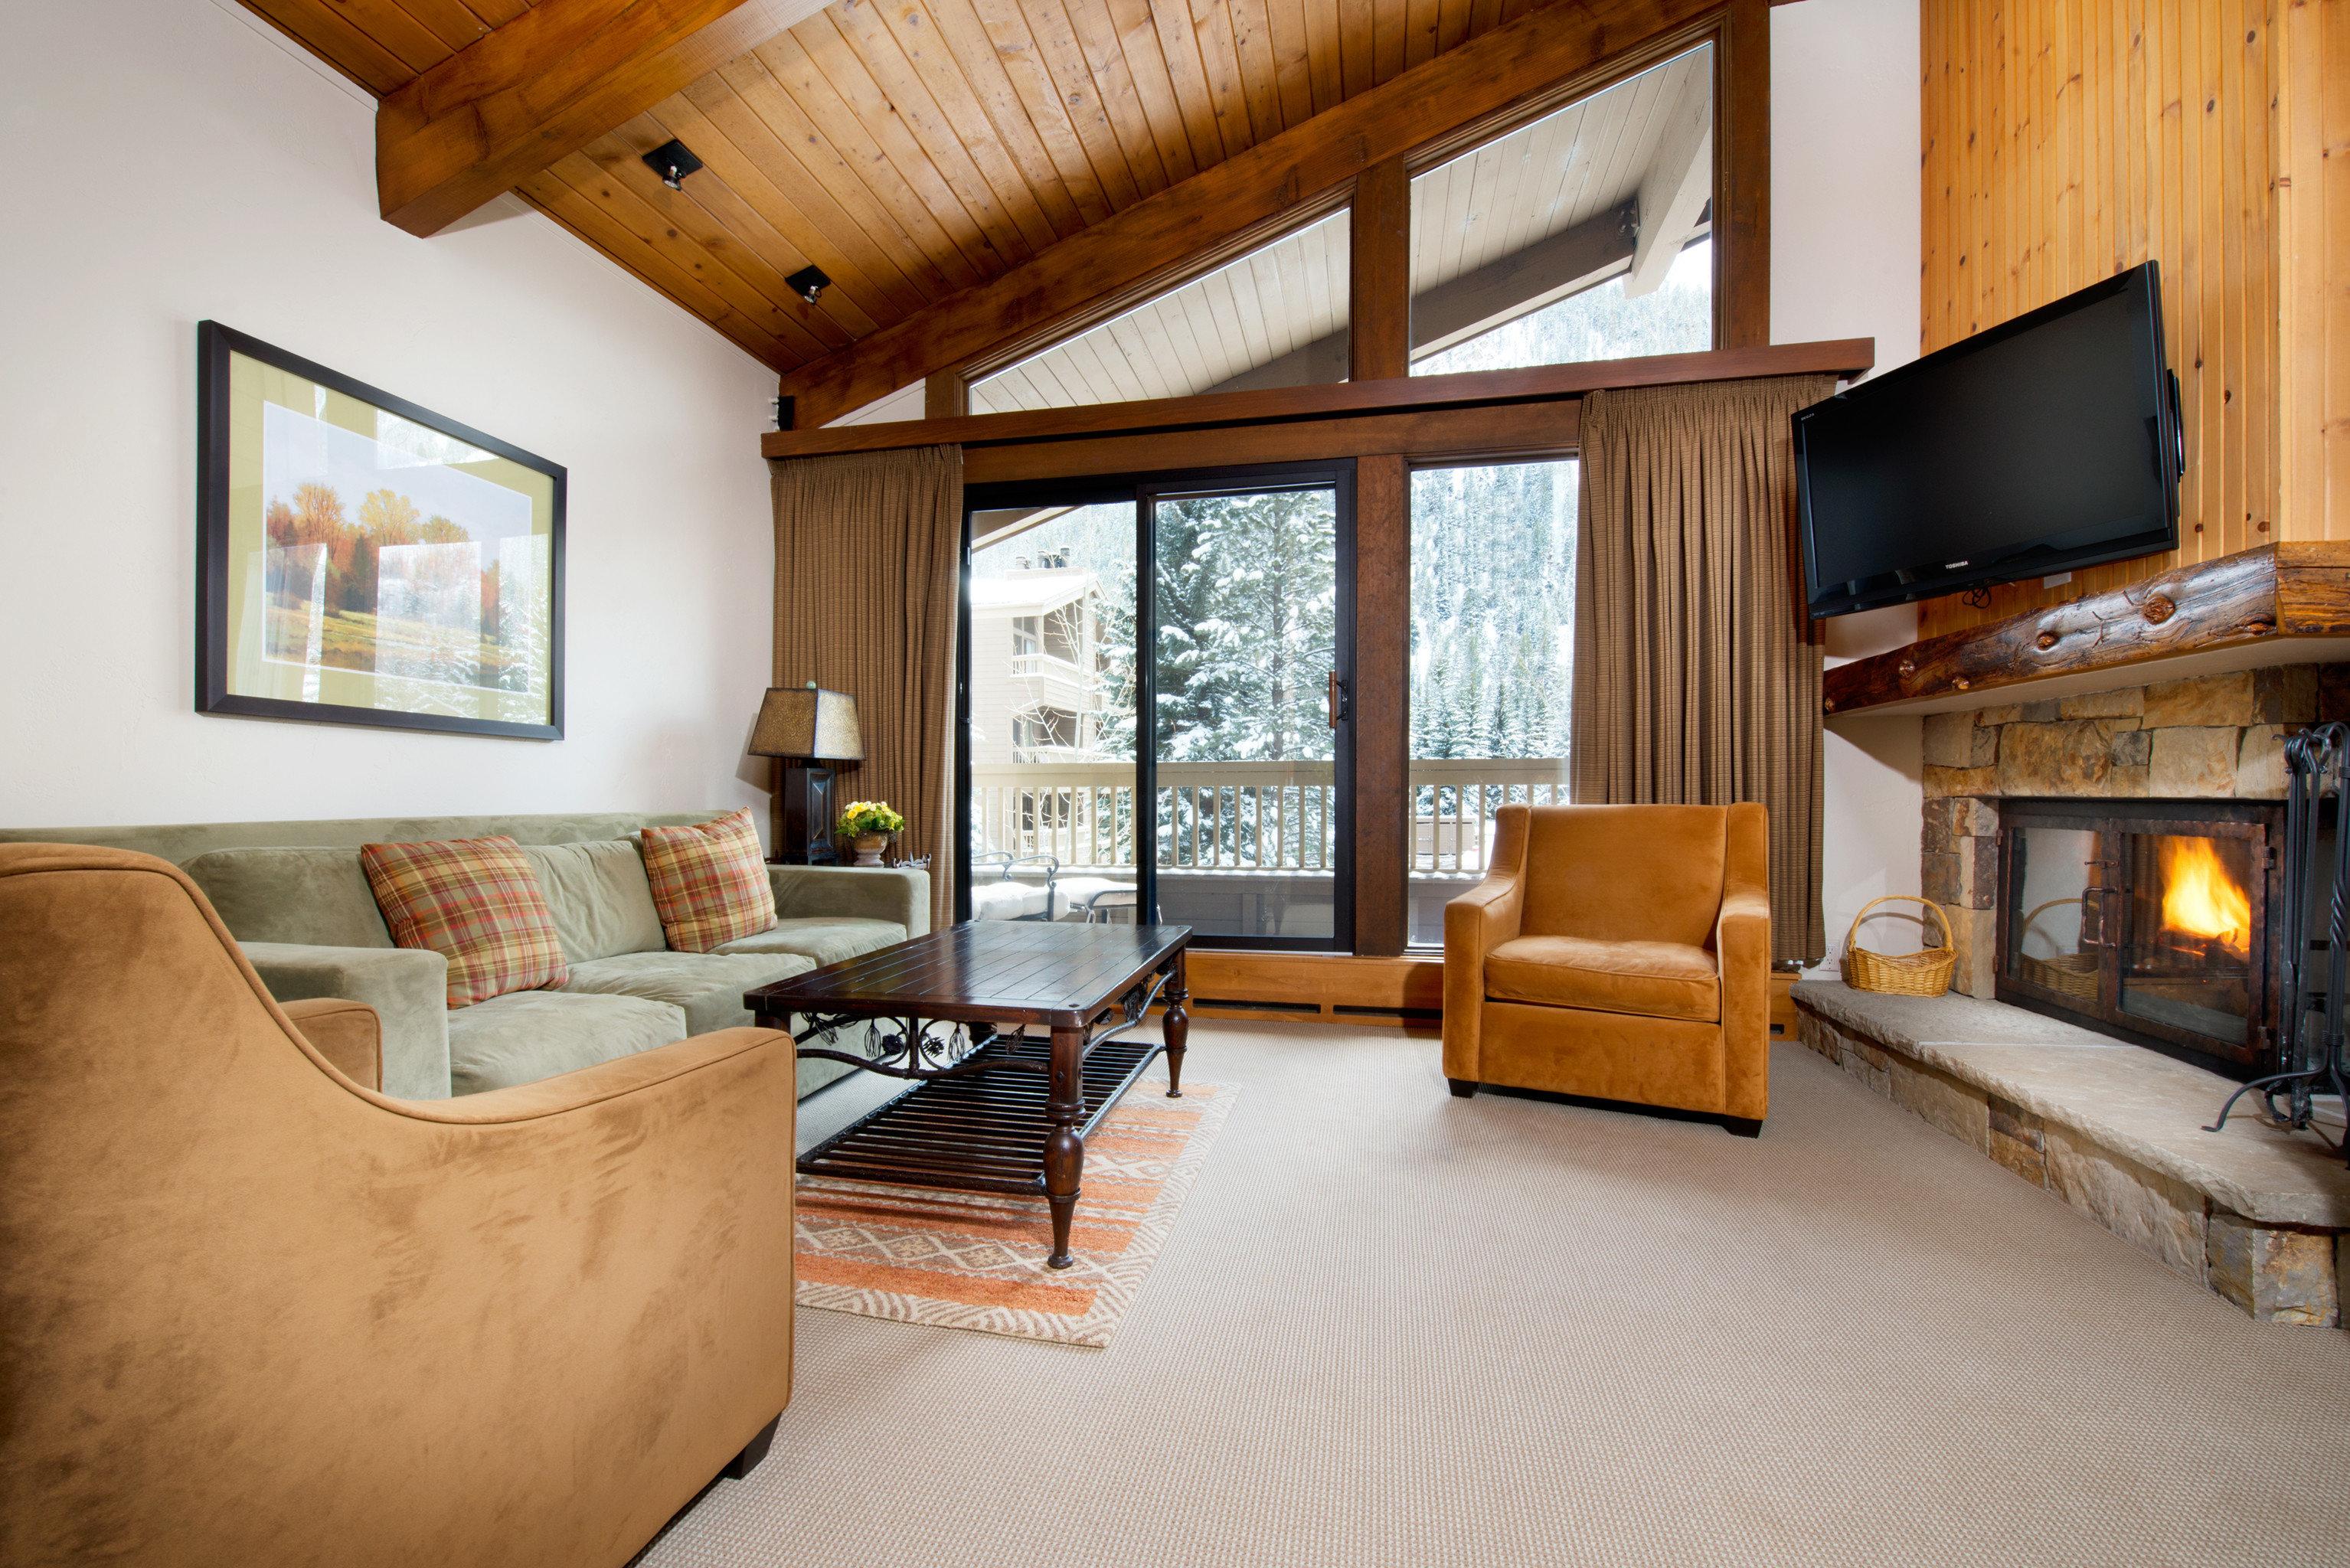 Rustic sofa property chair home living room house cottage hardwood Fireplace Villa farmhouse Bedroom Suite condominium